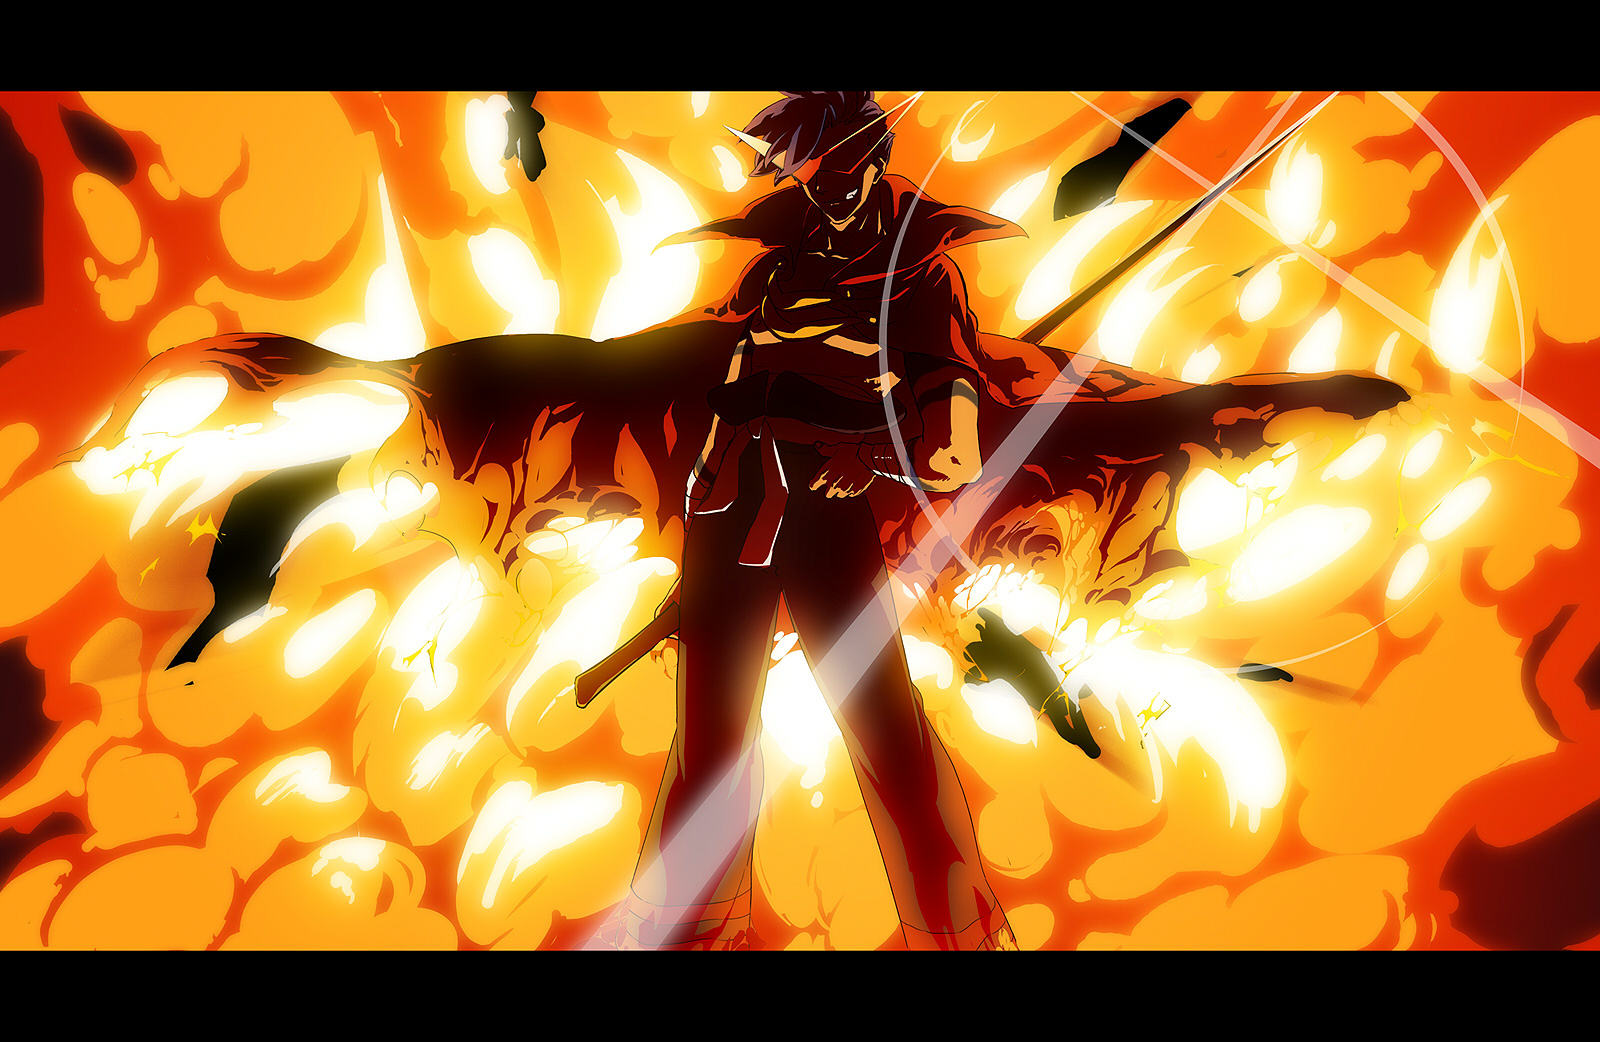 Tags anime tengen toppa gurren lagann kamina tengen toppa gurren